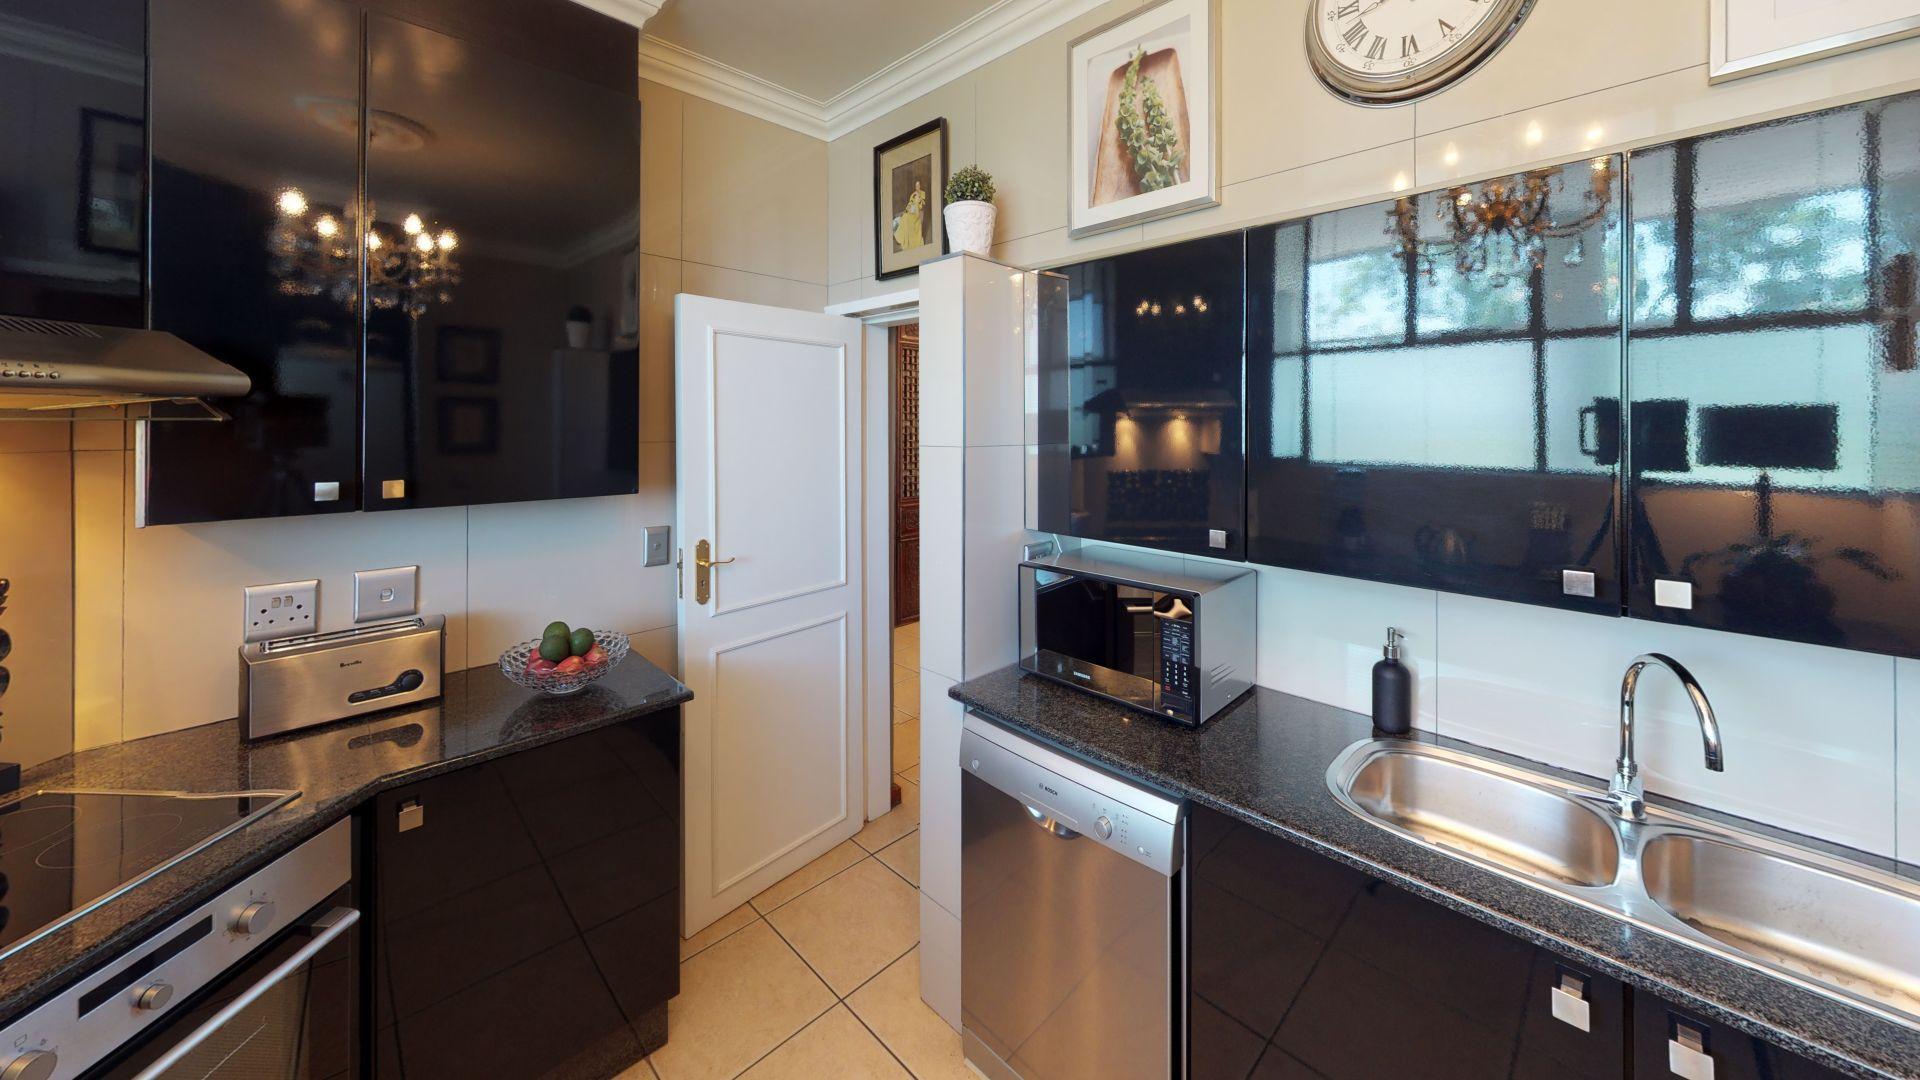 6-Lymington-Mews-Kitchen.jpg